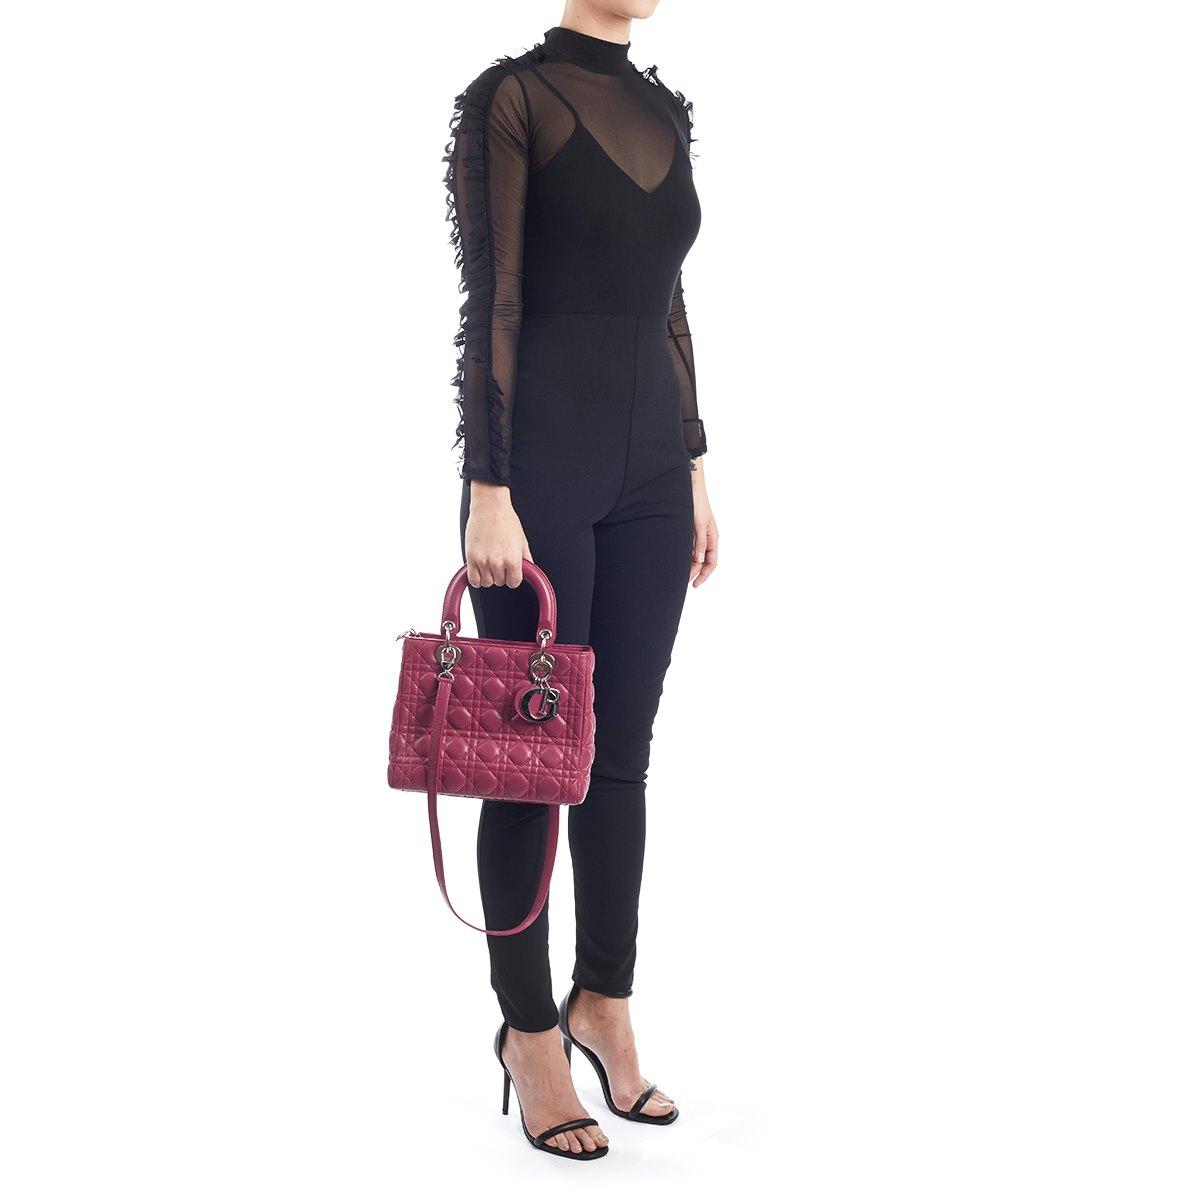 christian dior lady dior mm 2010 hb622 second hand handbags. Black Bedroom Furniture Sets. Home Design Ideas